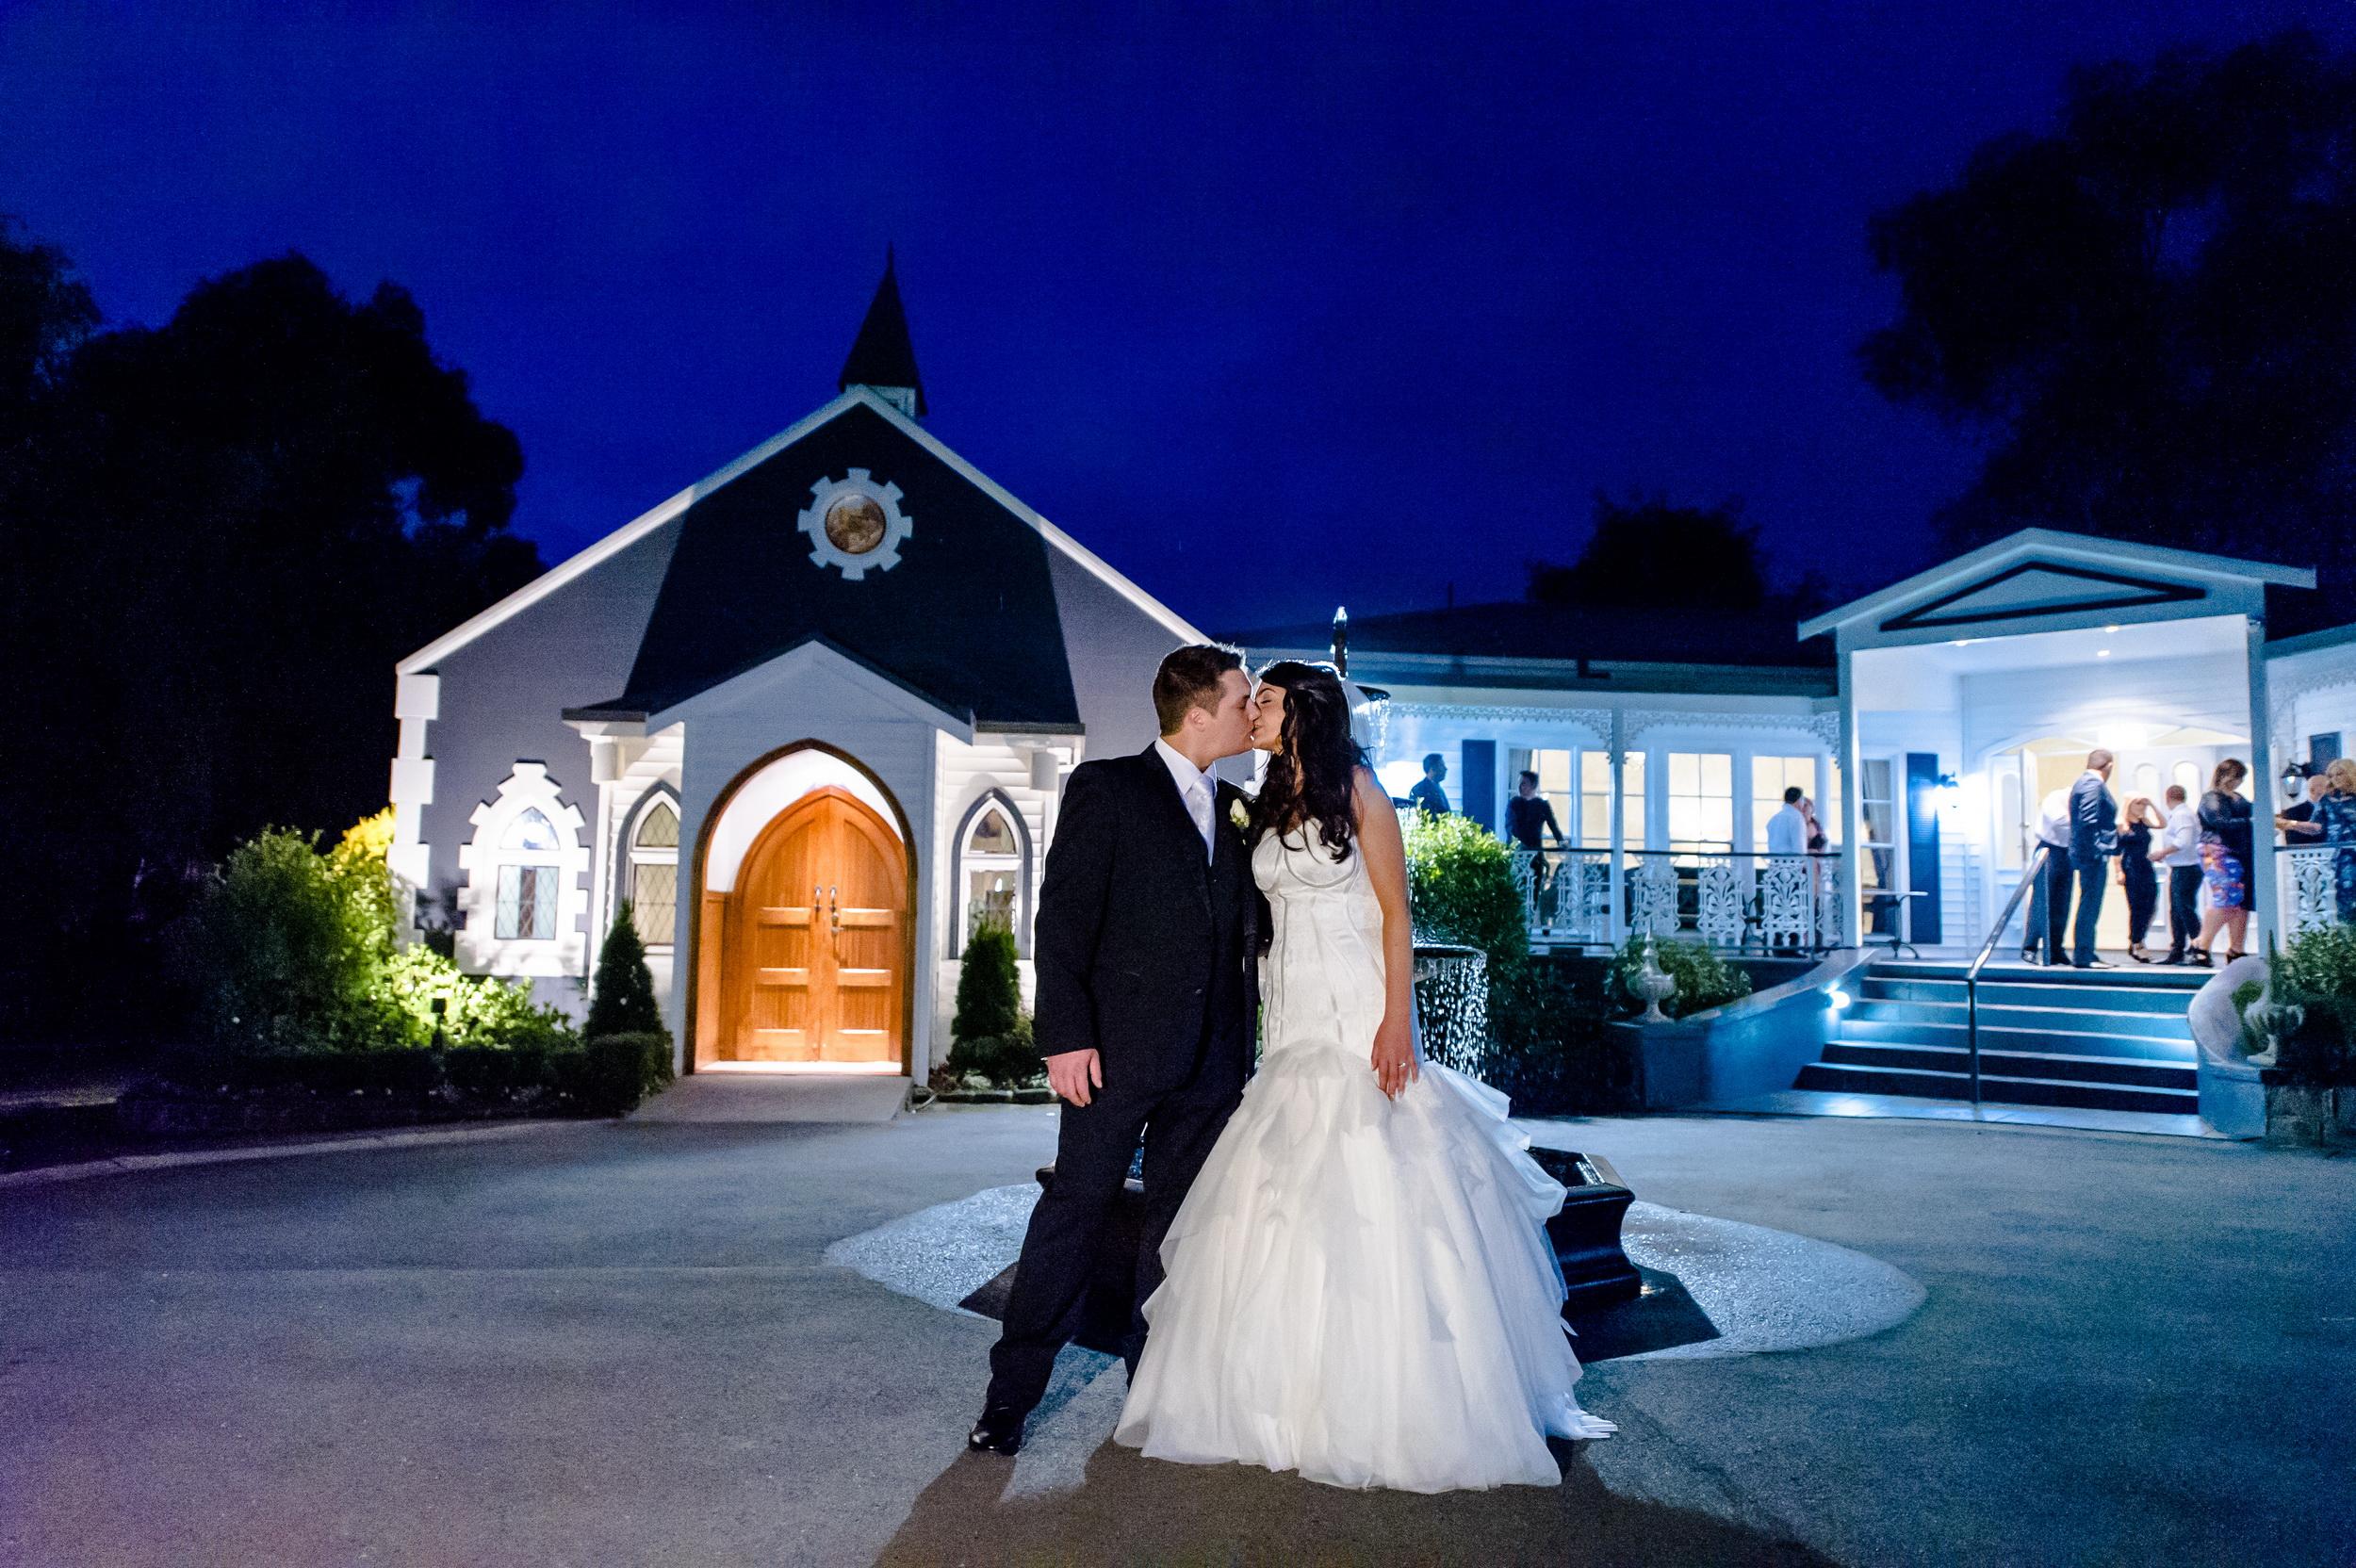 Rai & Shaun - Wedding photography & Ballara Receptions